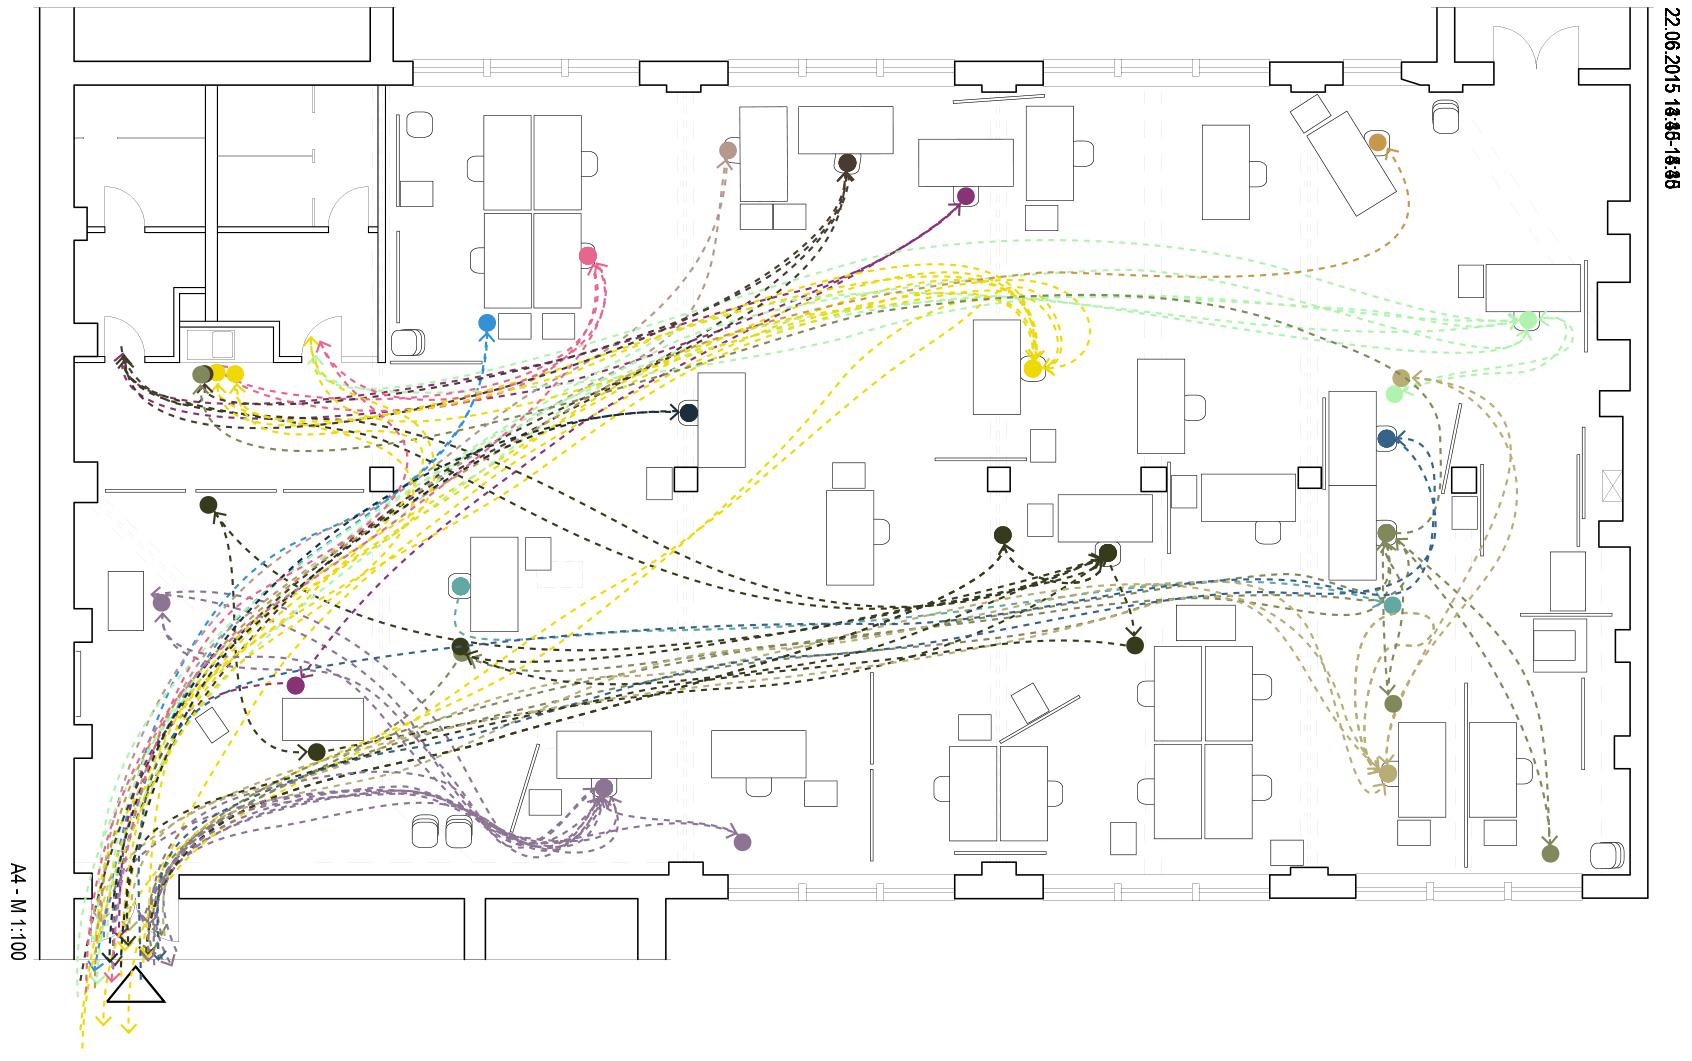 Forschungsprojekt: ArchitekturenExperimente